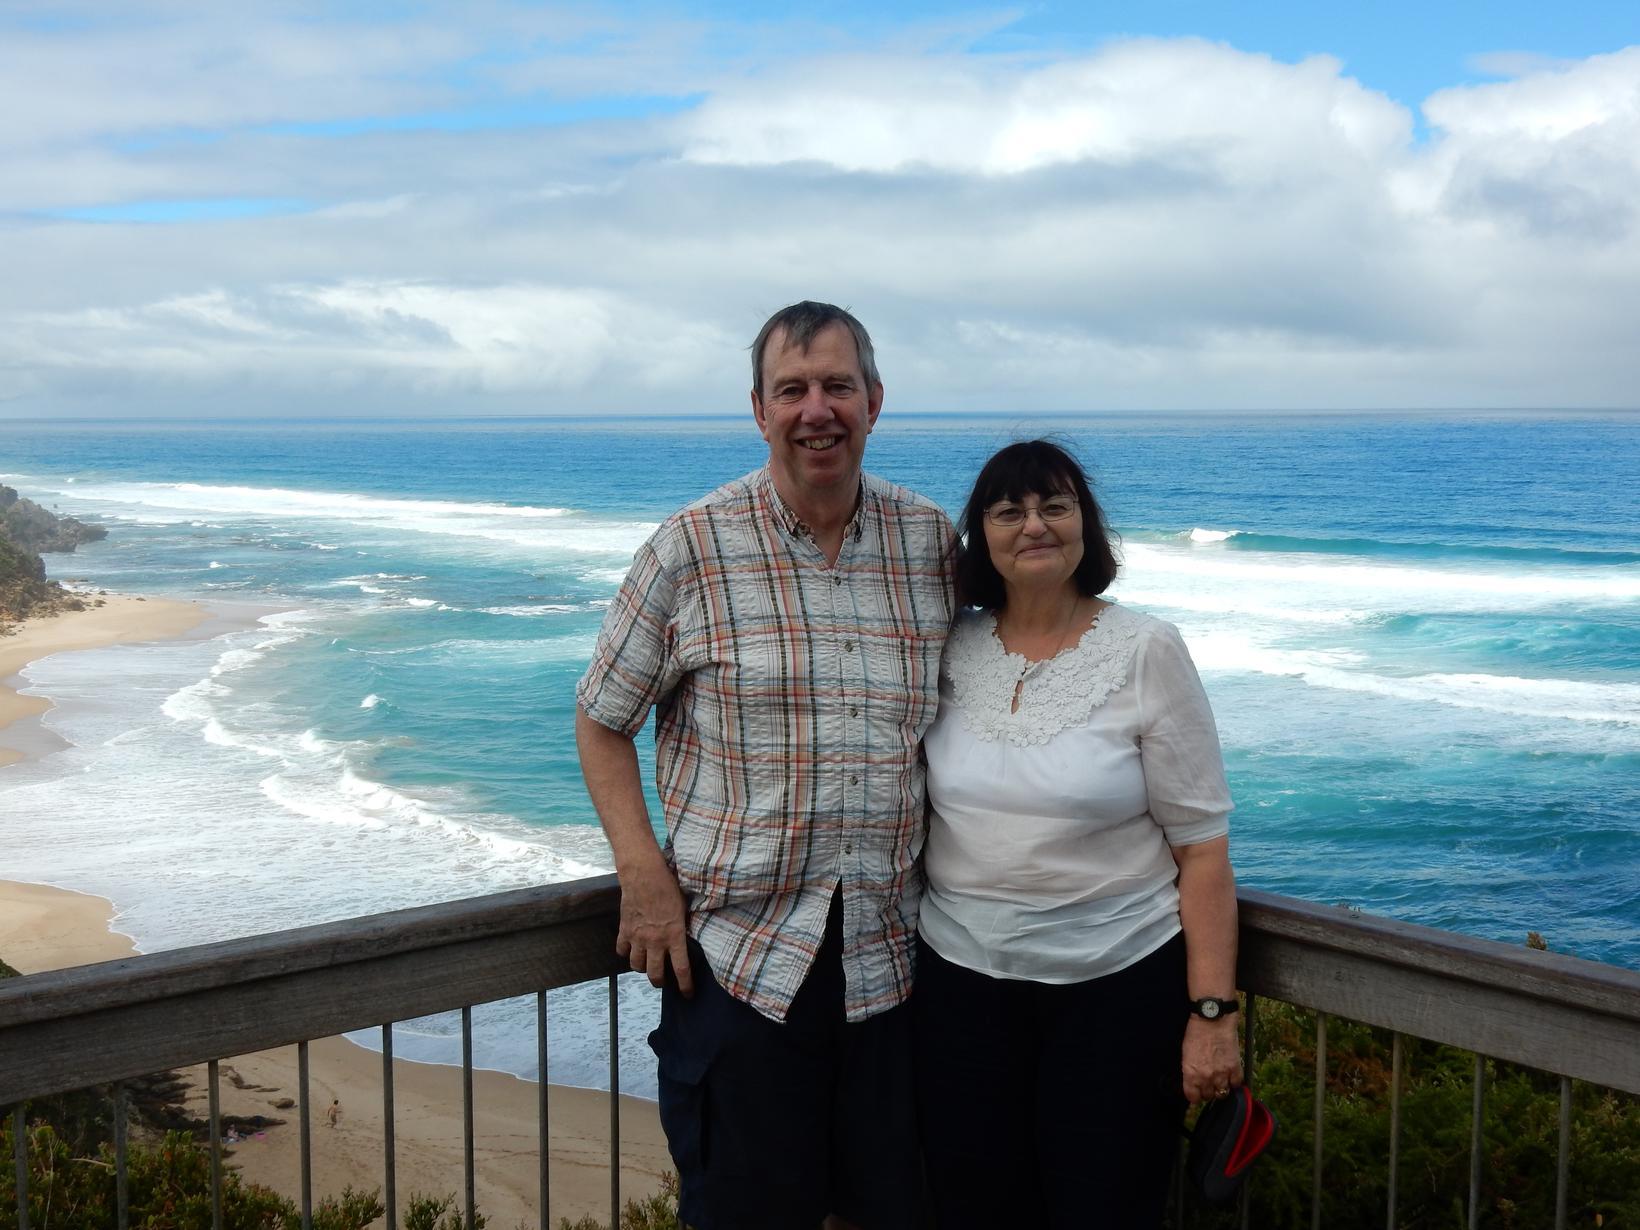 Jane richard & Richard from Bexhill-on-Sea, United Kingdom